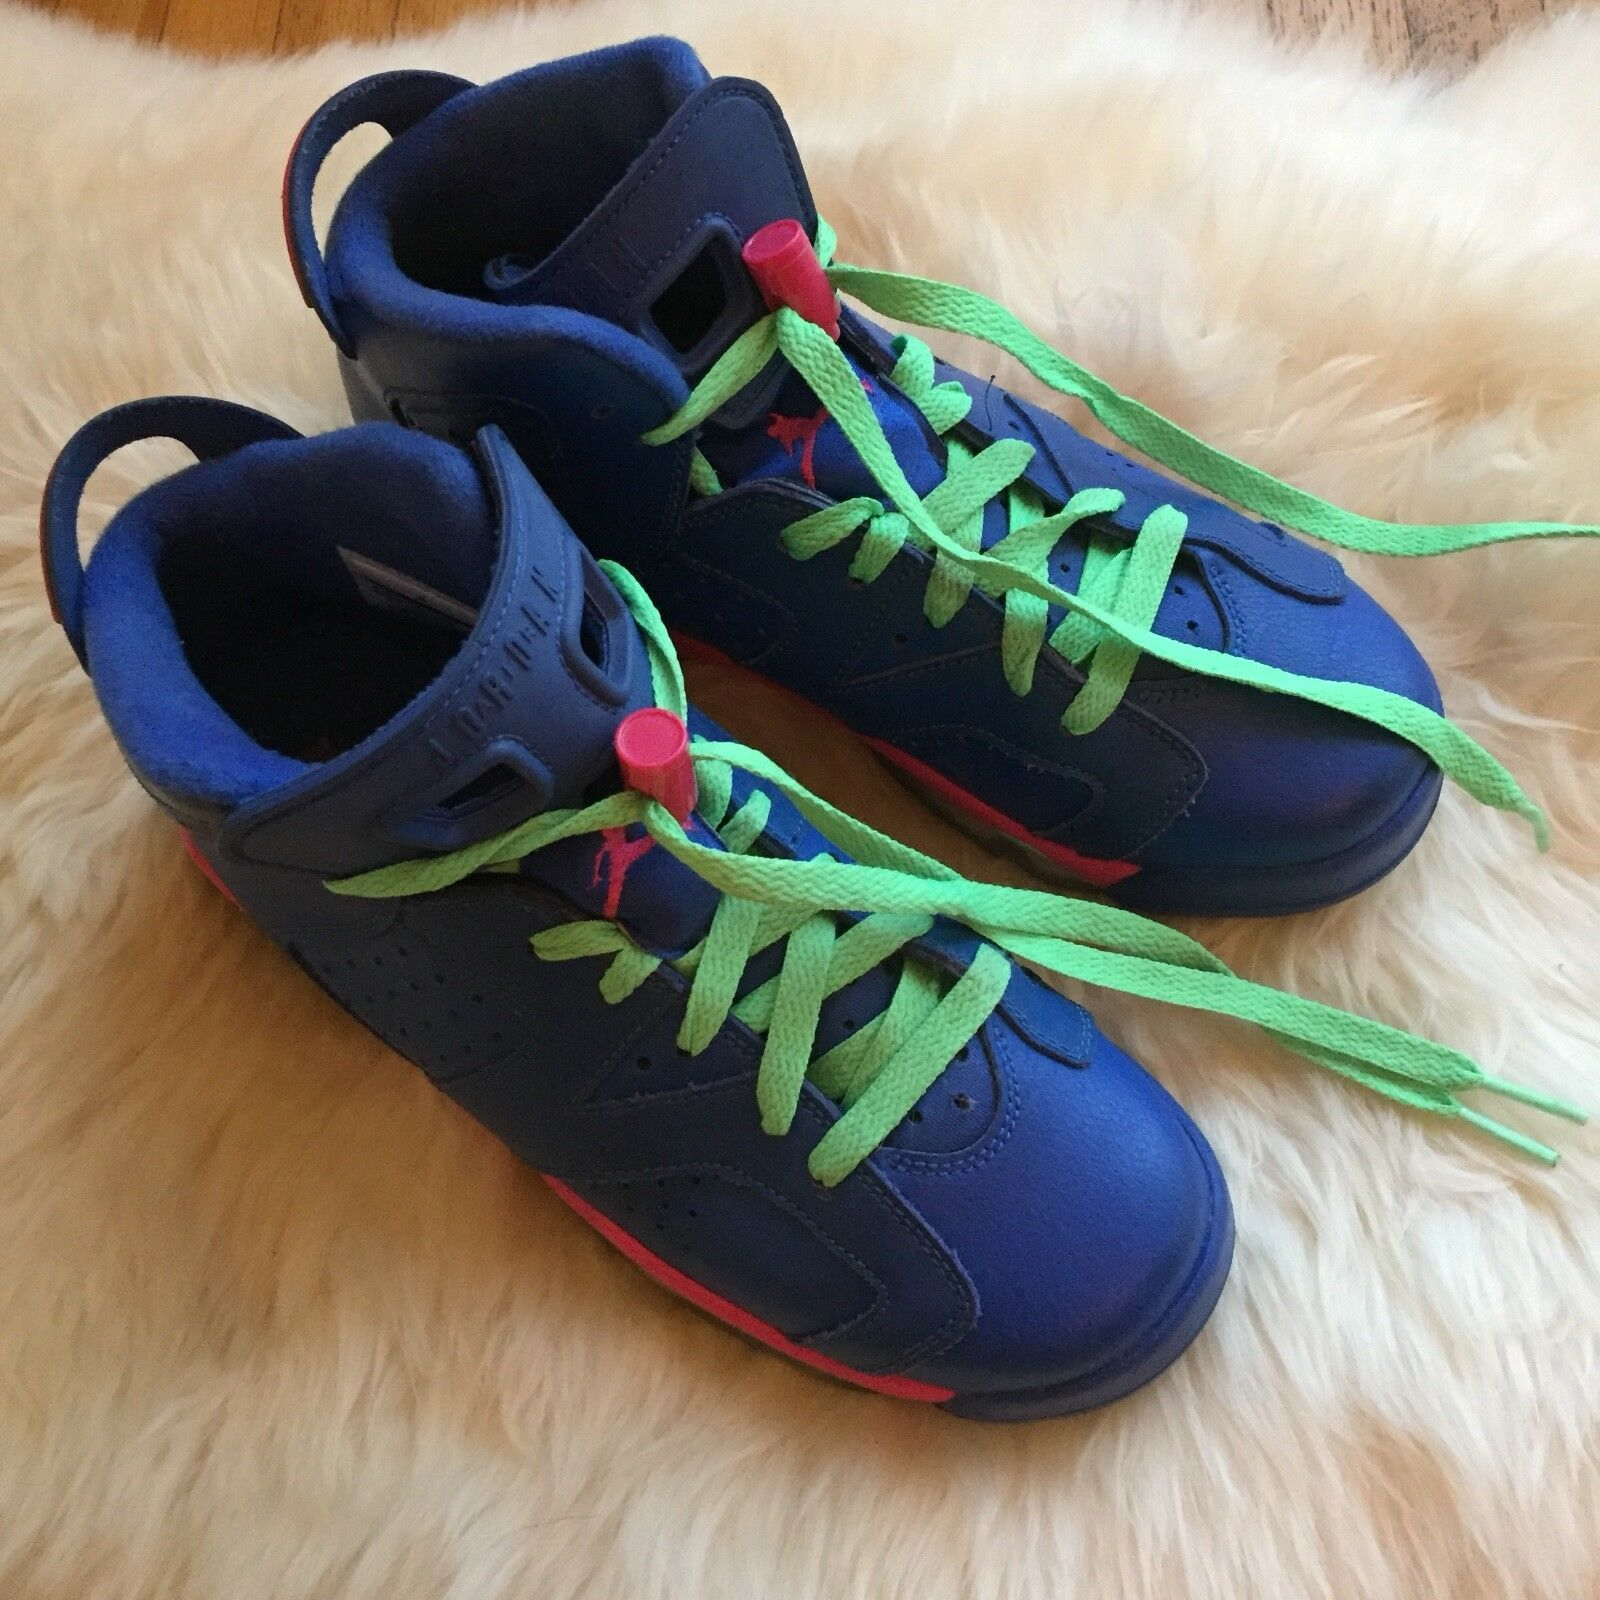 Nike Air Jordan VI Game Royal 6 Retro GS Pink 7.5 (6.5 youth)